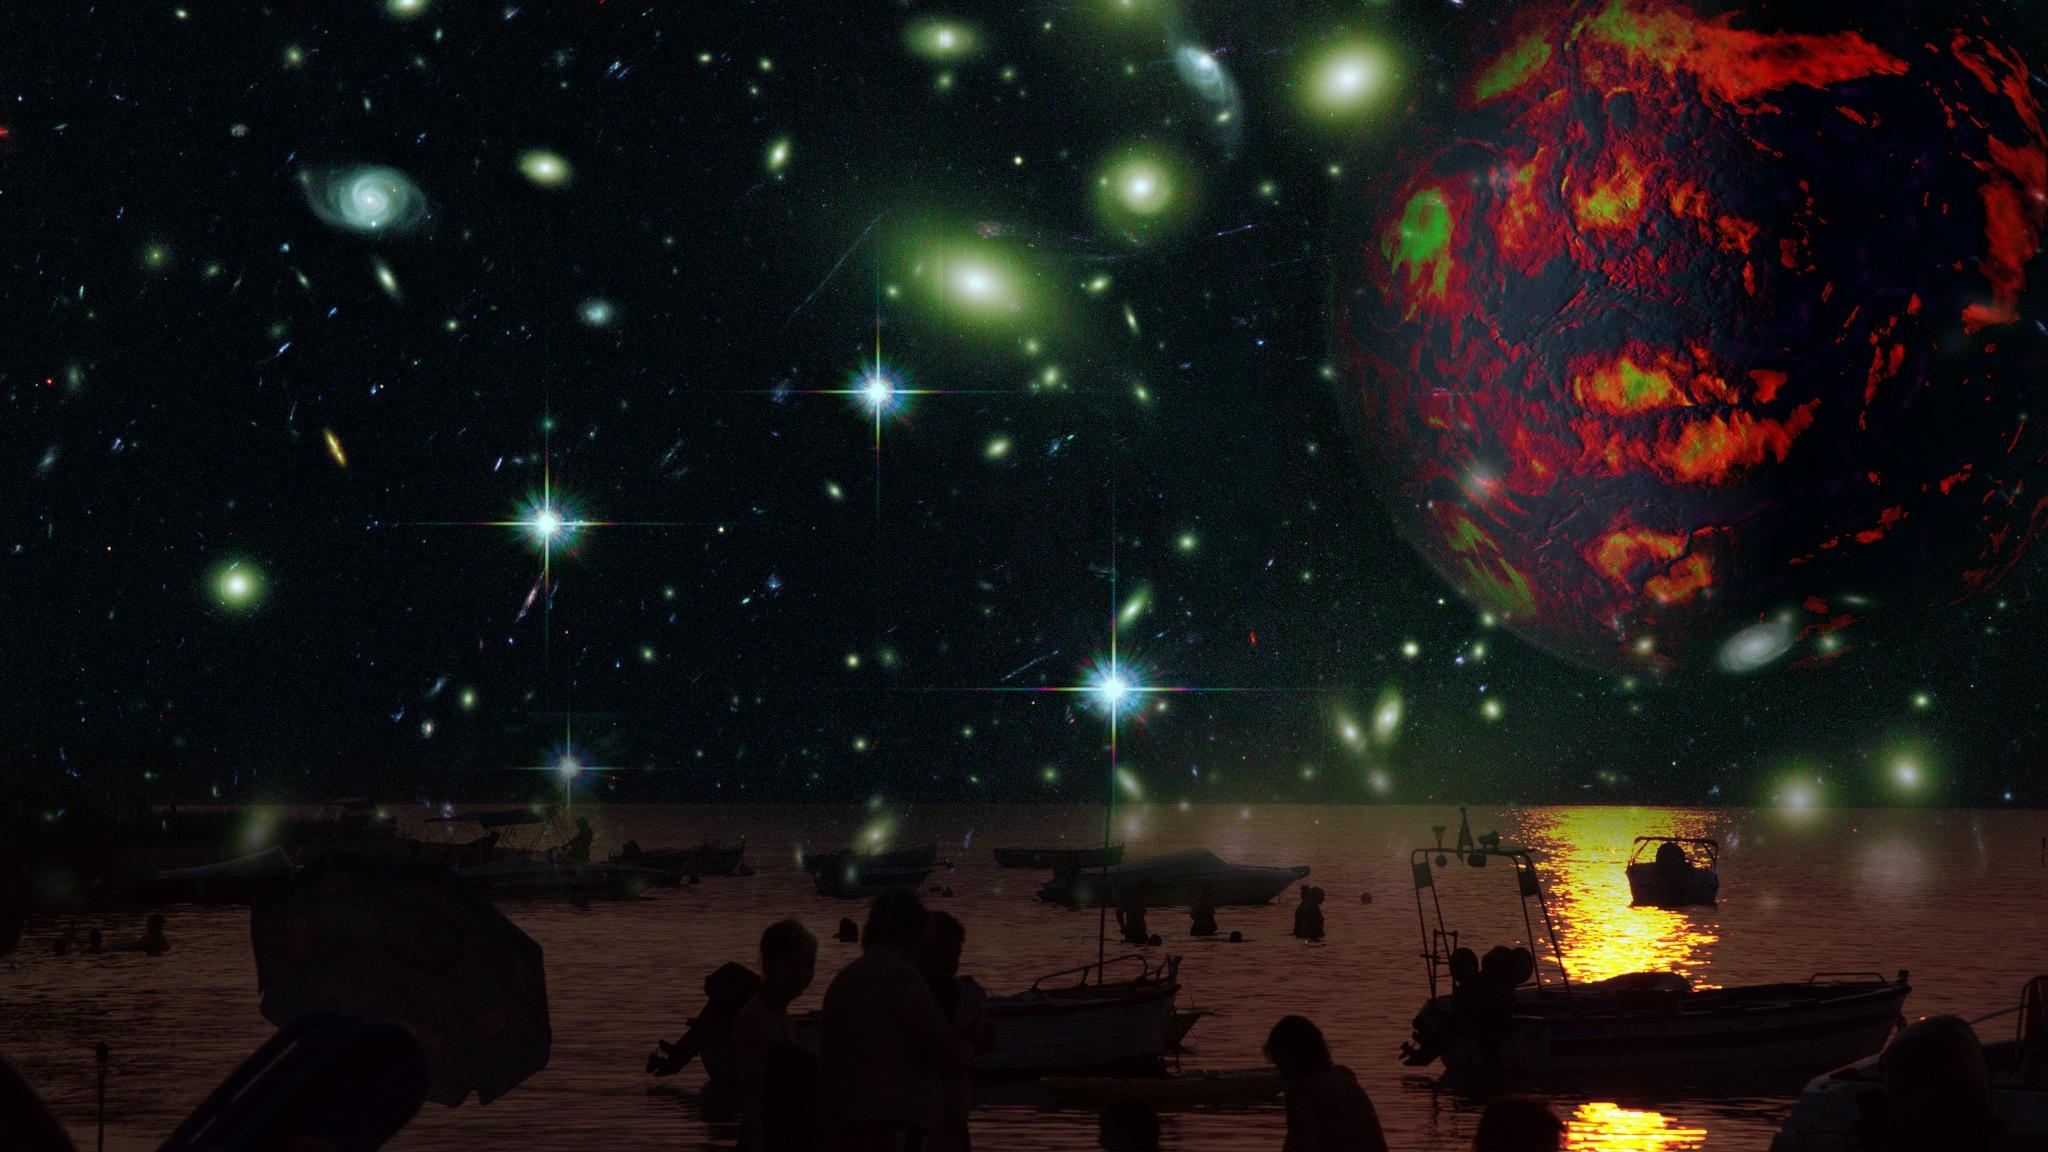 Future sky by Florian B